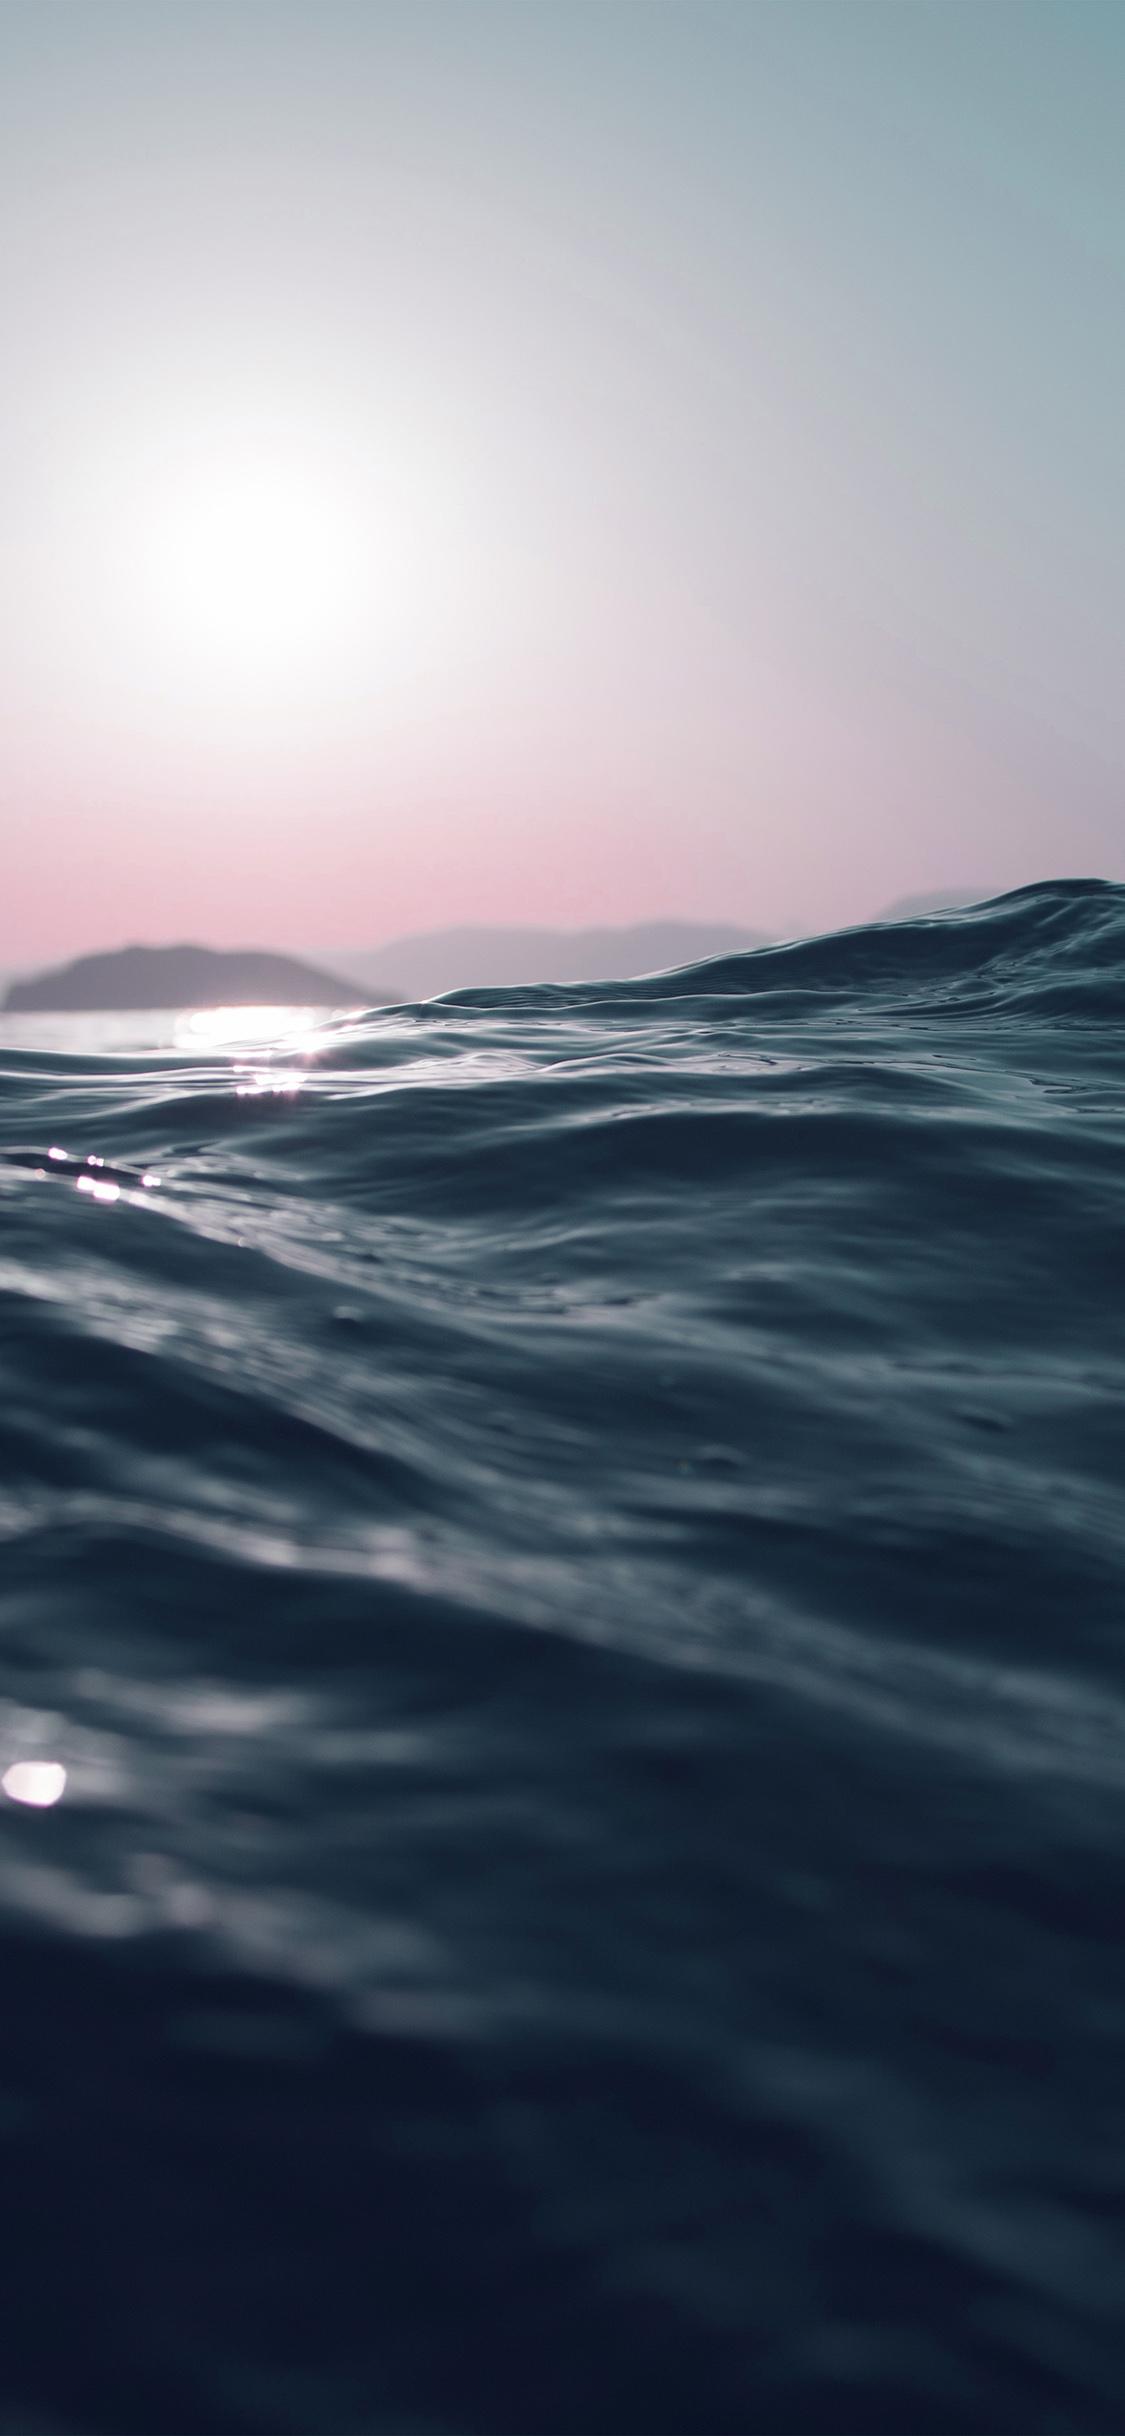 Iphone11papers Com Iphone11 Wallpaper Mt83 Sea Dive Wave Dark Summer Ocean Nature Blue